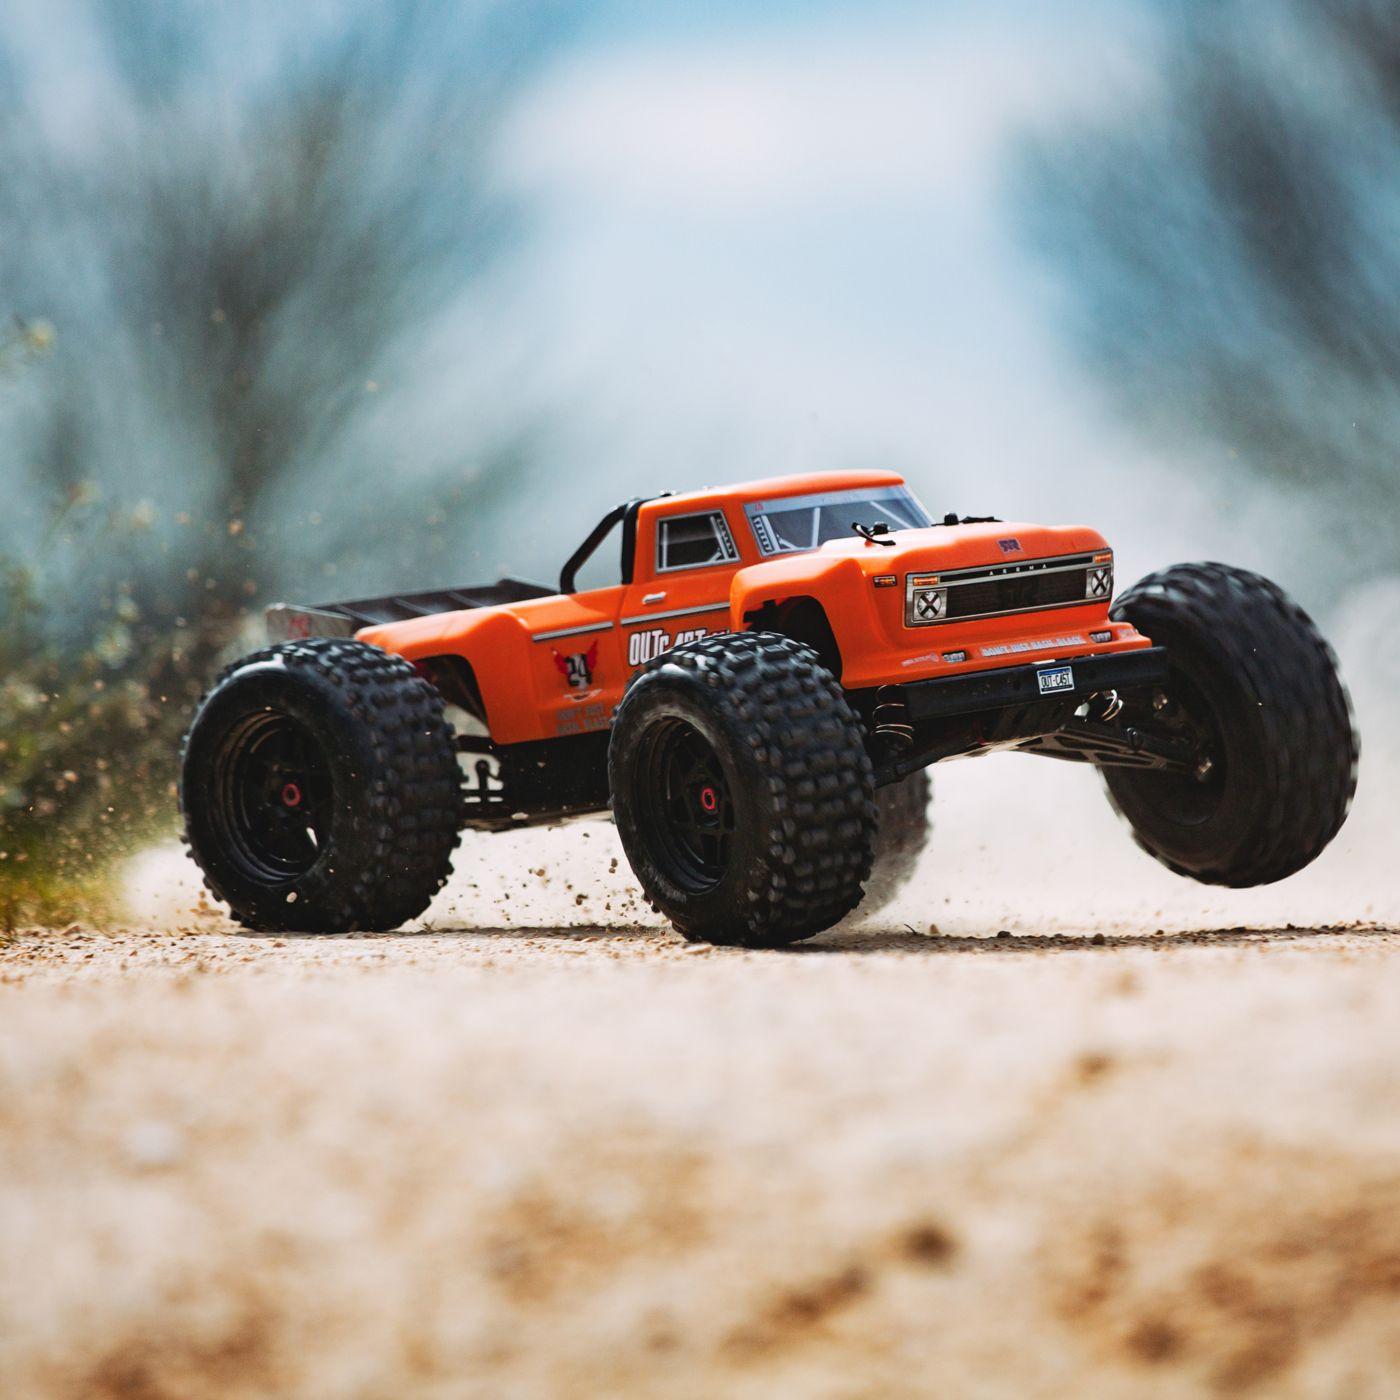 Arrma Outcast 6S BLX 4WD Stunt Truck orange rtr 3